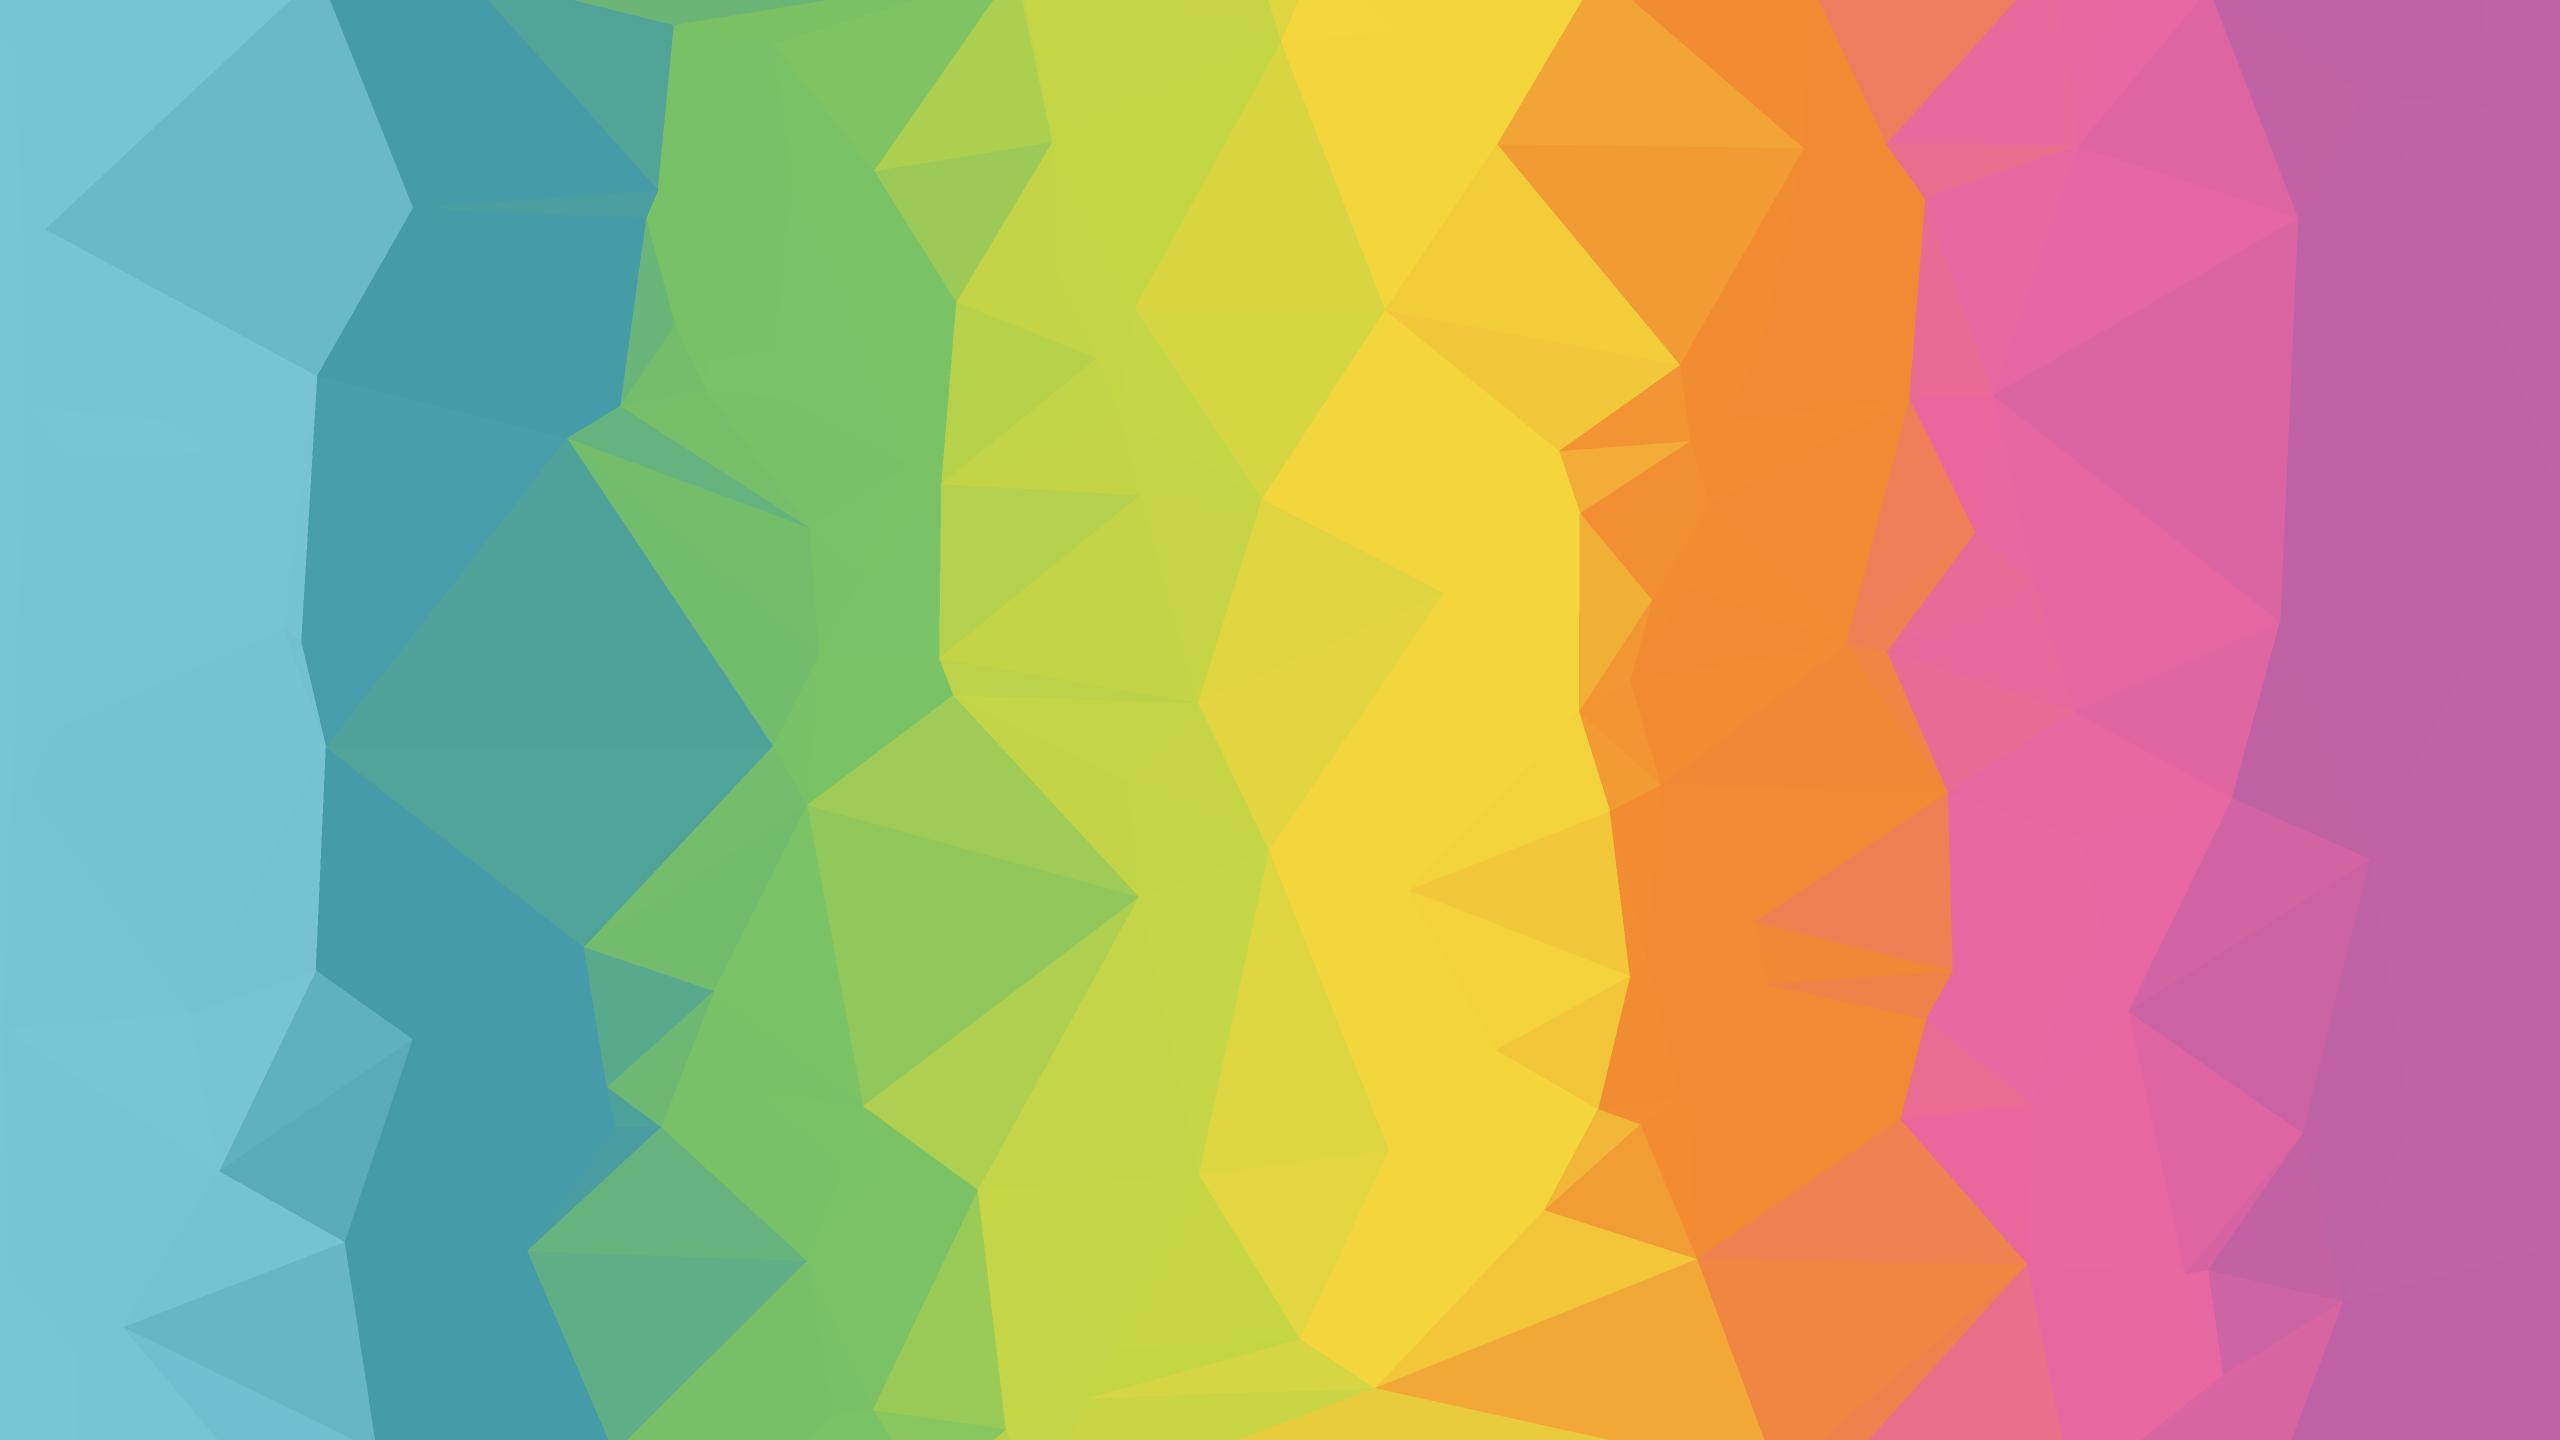 Wallpaper Geometric Color 4 2K UHD by AIRWORLDKING on DeviantArt